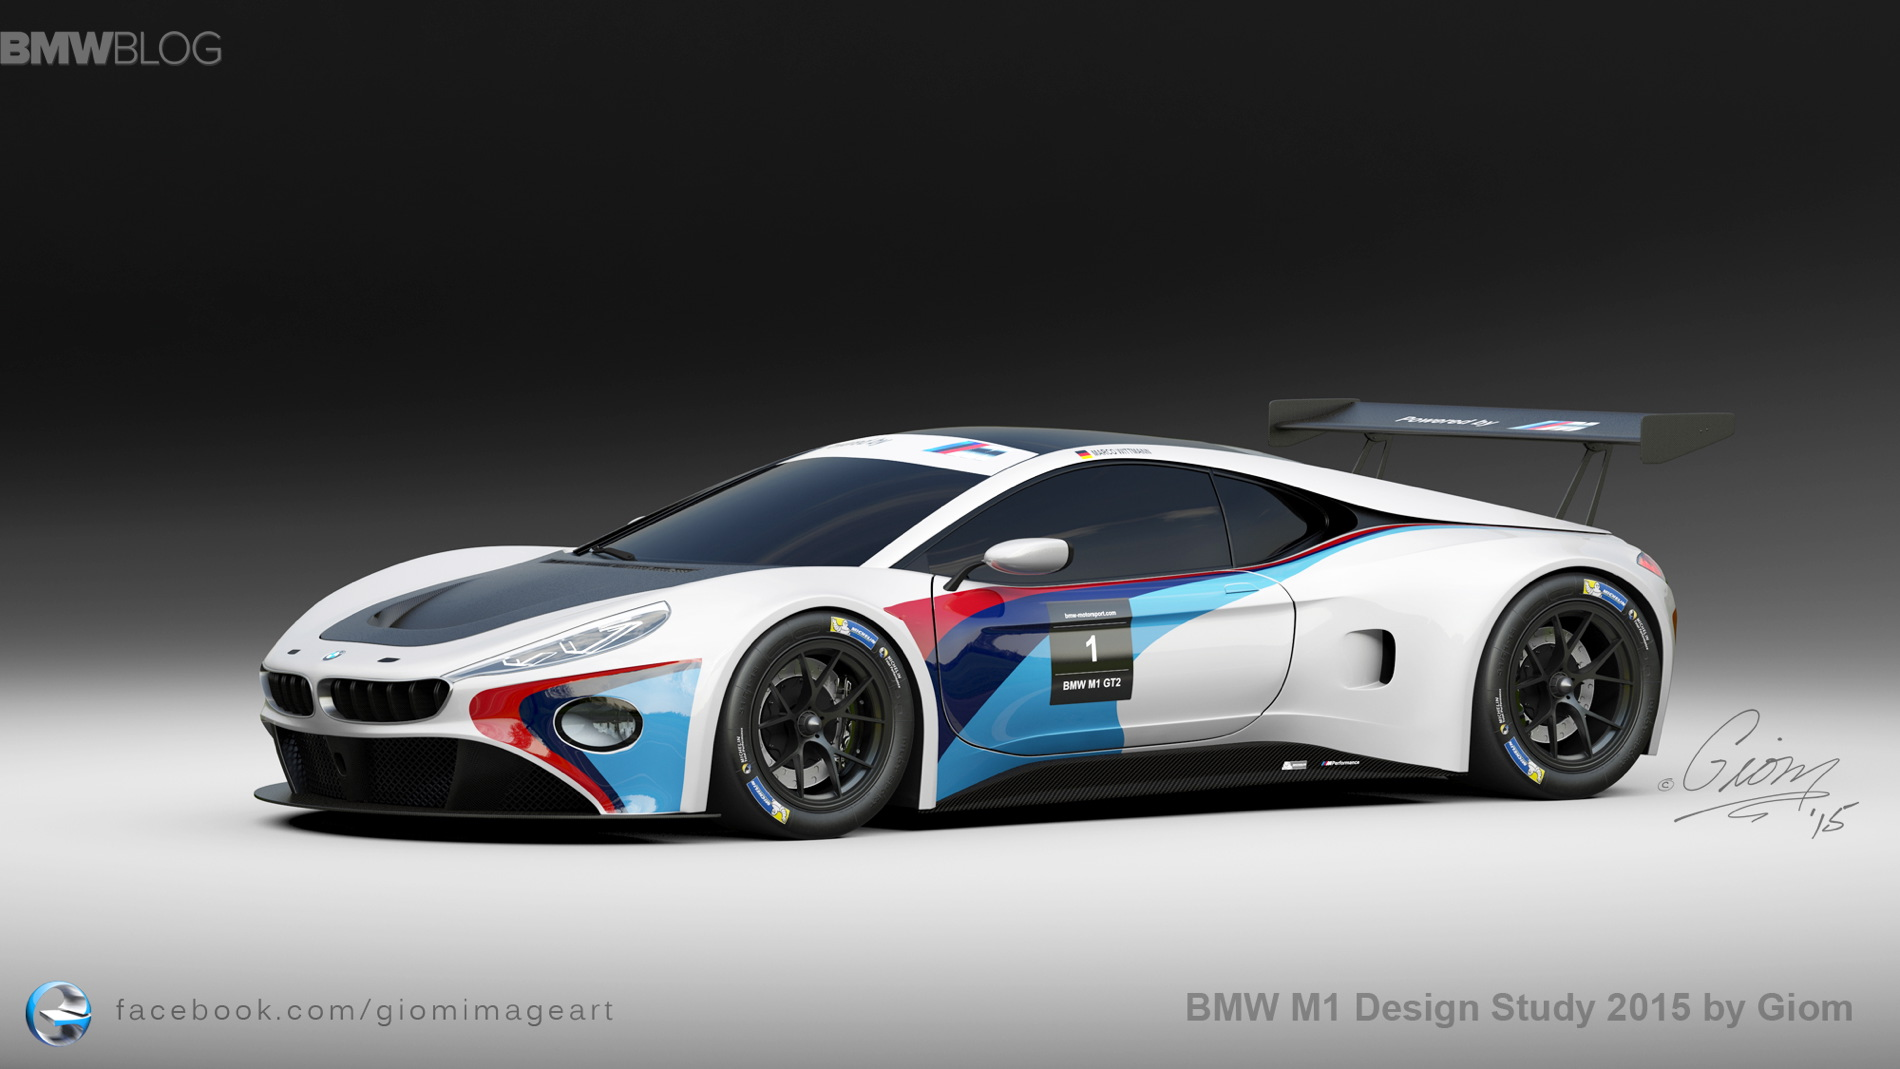 Exotic Cars Wallpaper Pack Bmw M1 Design Study Shows A Futuristic Supercar